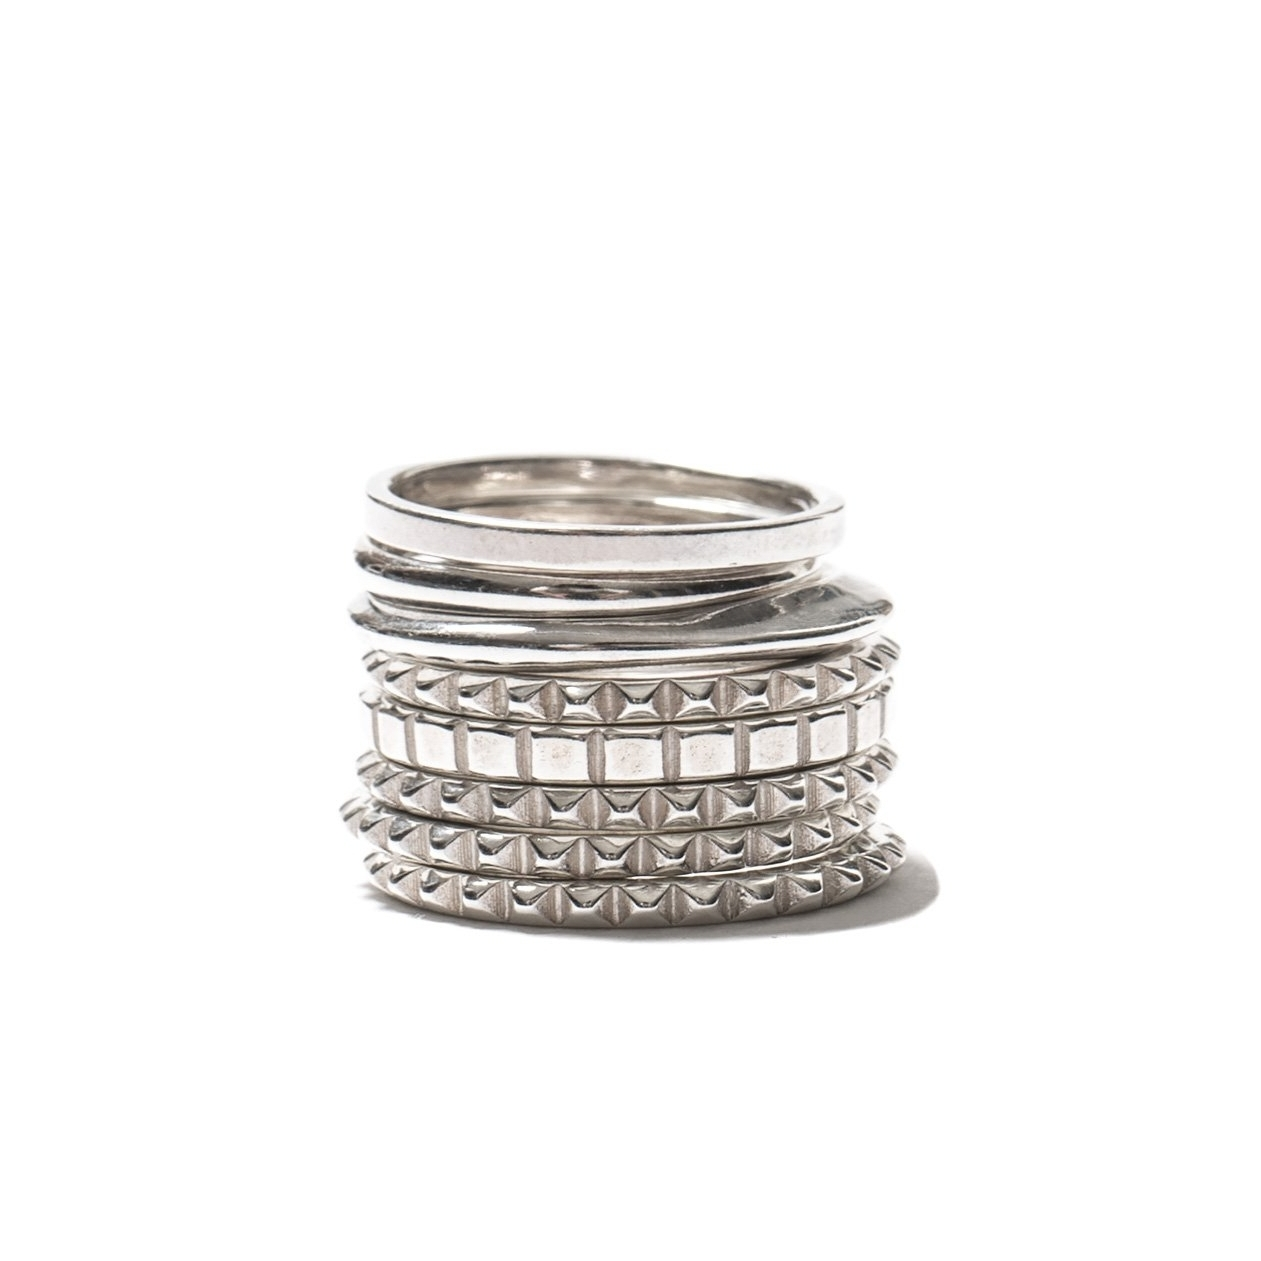 YSTRDYS-TMRRW-8P-Layer-Ring-by-END-Silver-1_2048x2048.jpg